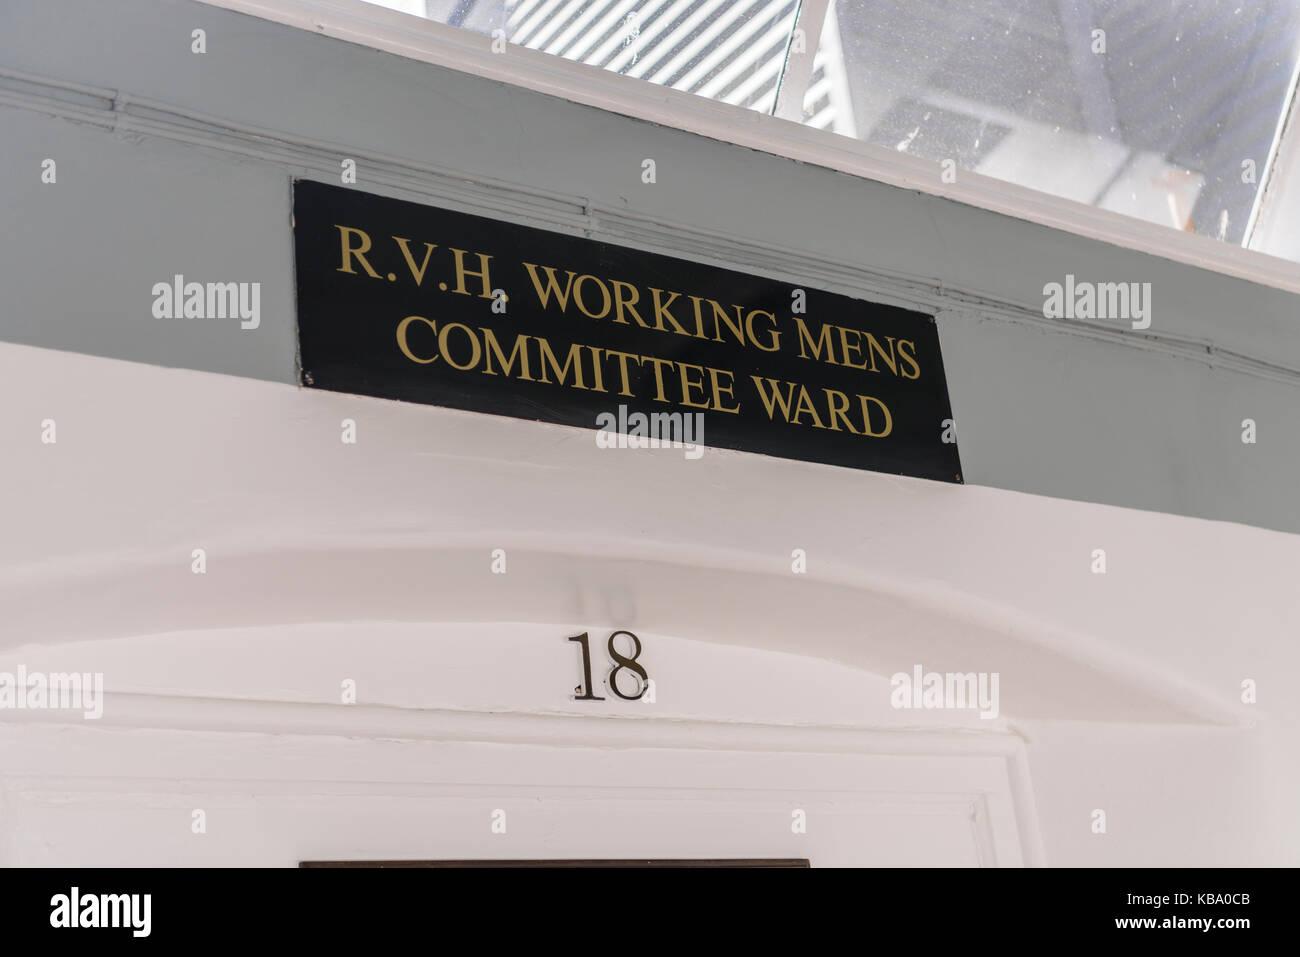 Ward 18 (RVH Working Mens' Committee Ward) at the oldVictorian corridor, Royal Victoria Hospital, Belfast. - Stock Image